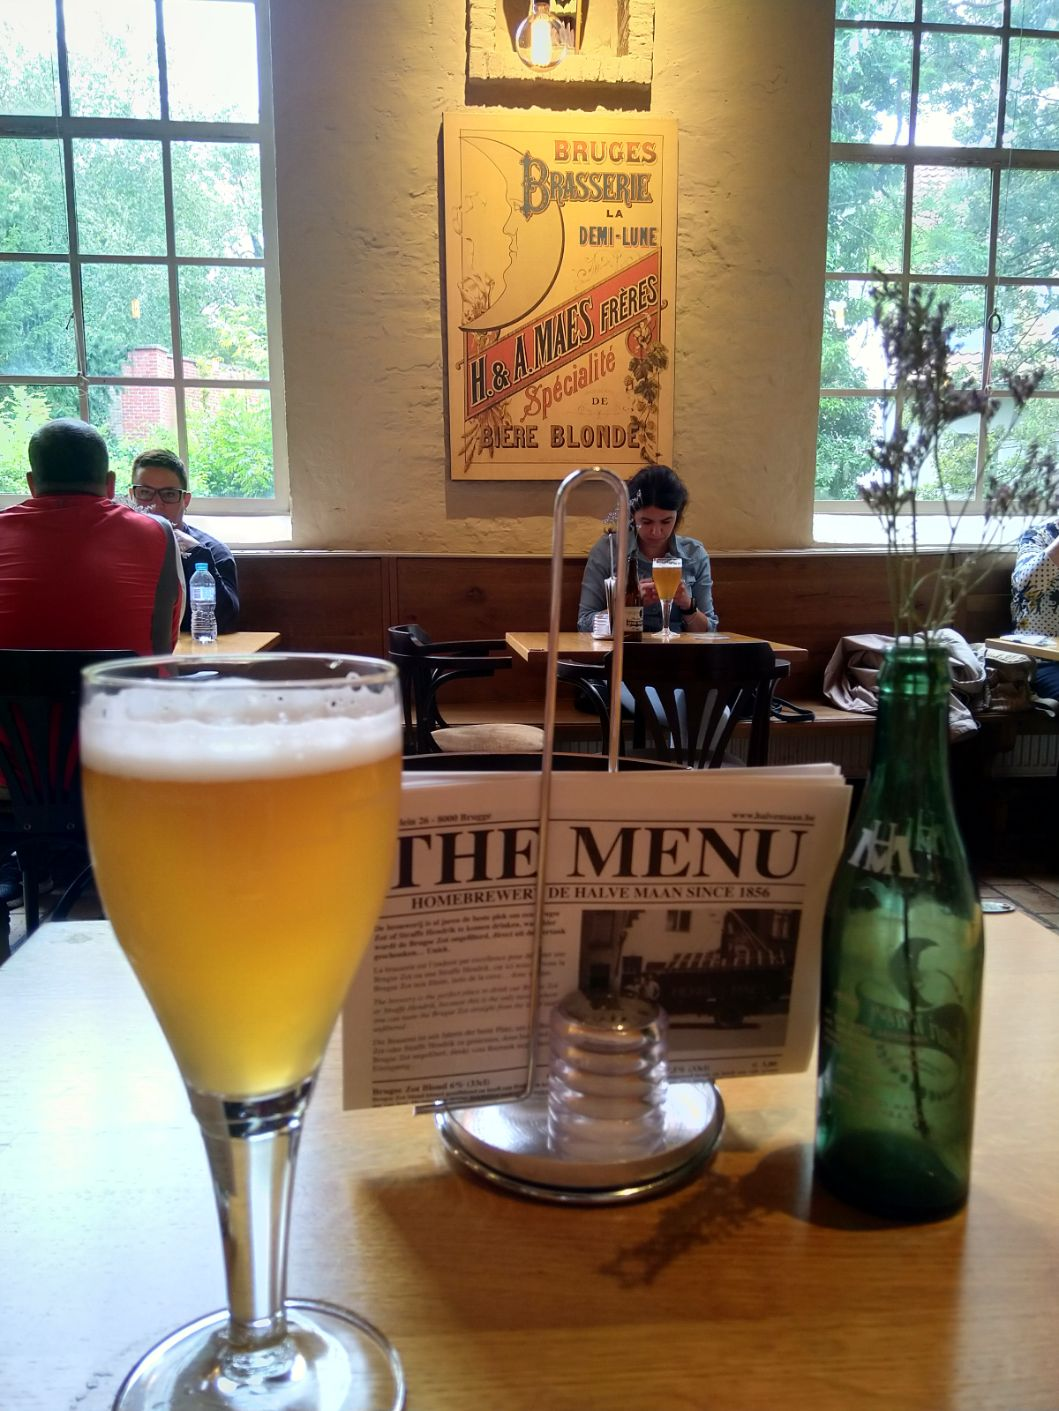 U restoranu De Halve Maan pivare